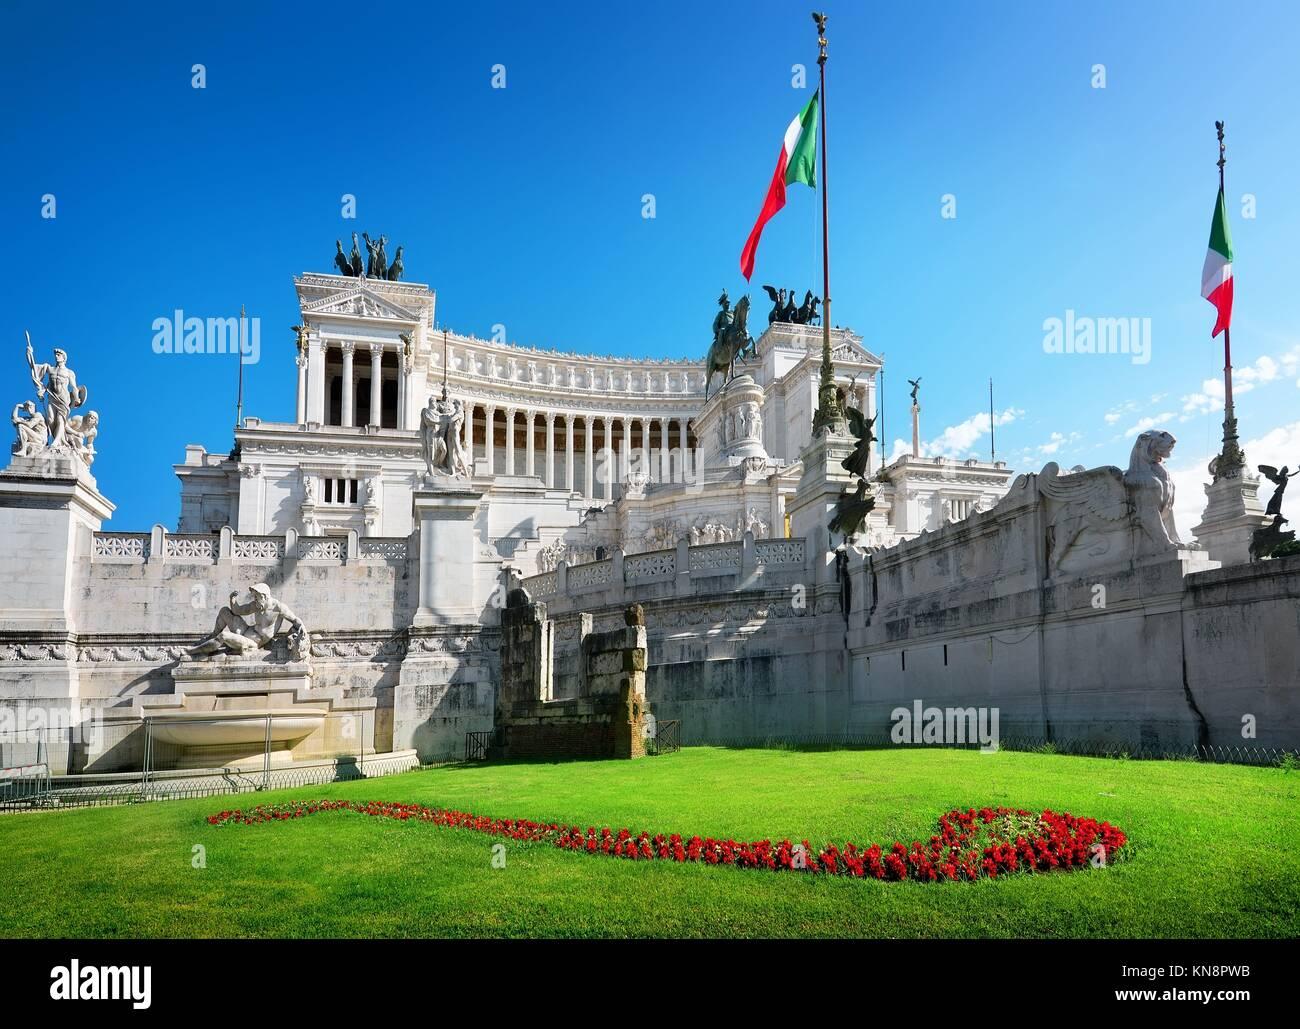 Monument à Piazza Venezia, Rome, Italie. Photo Stock